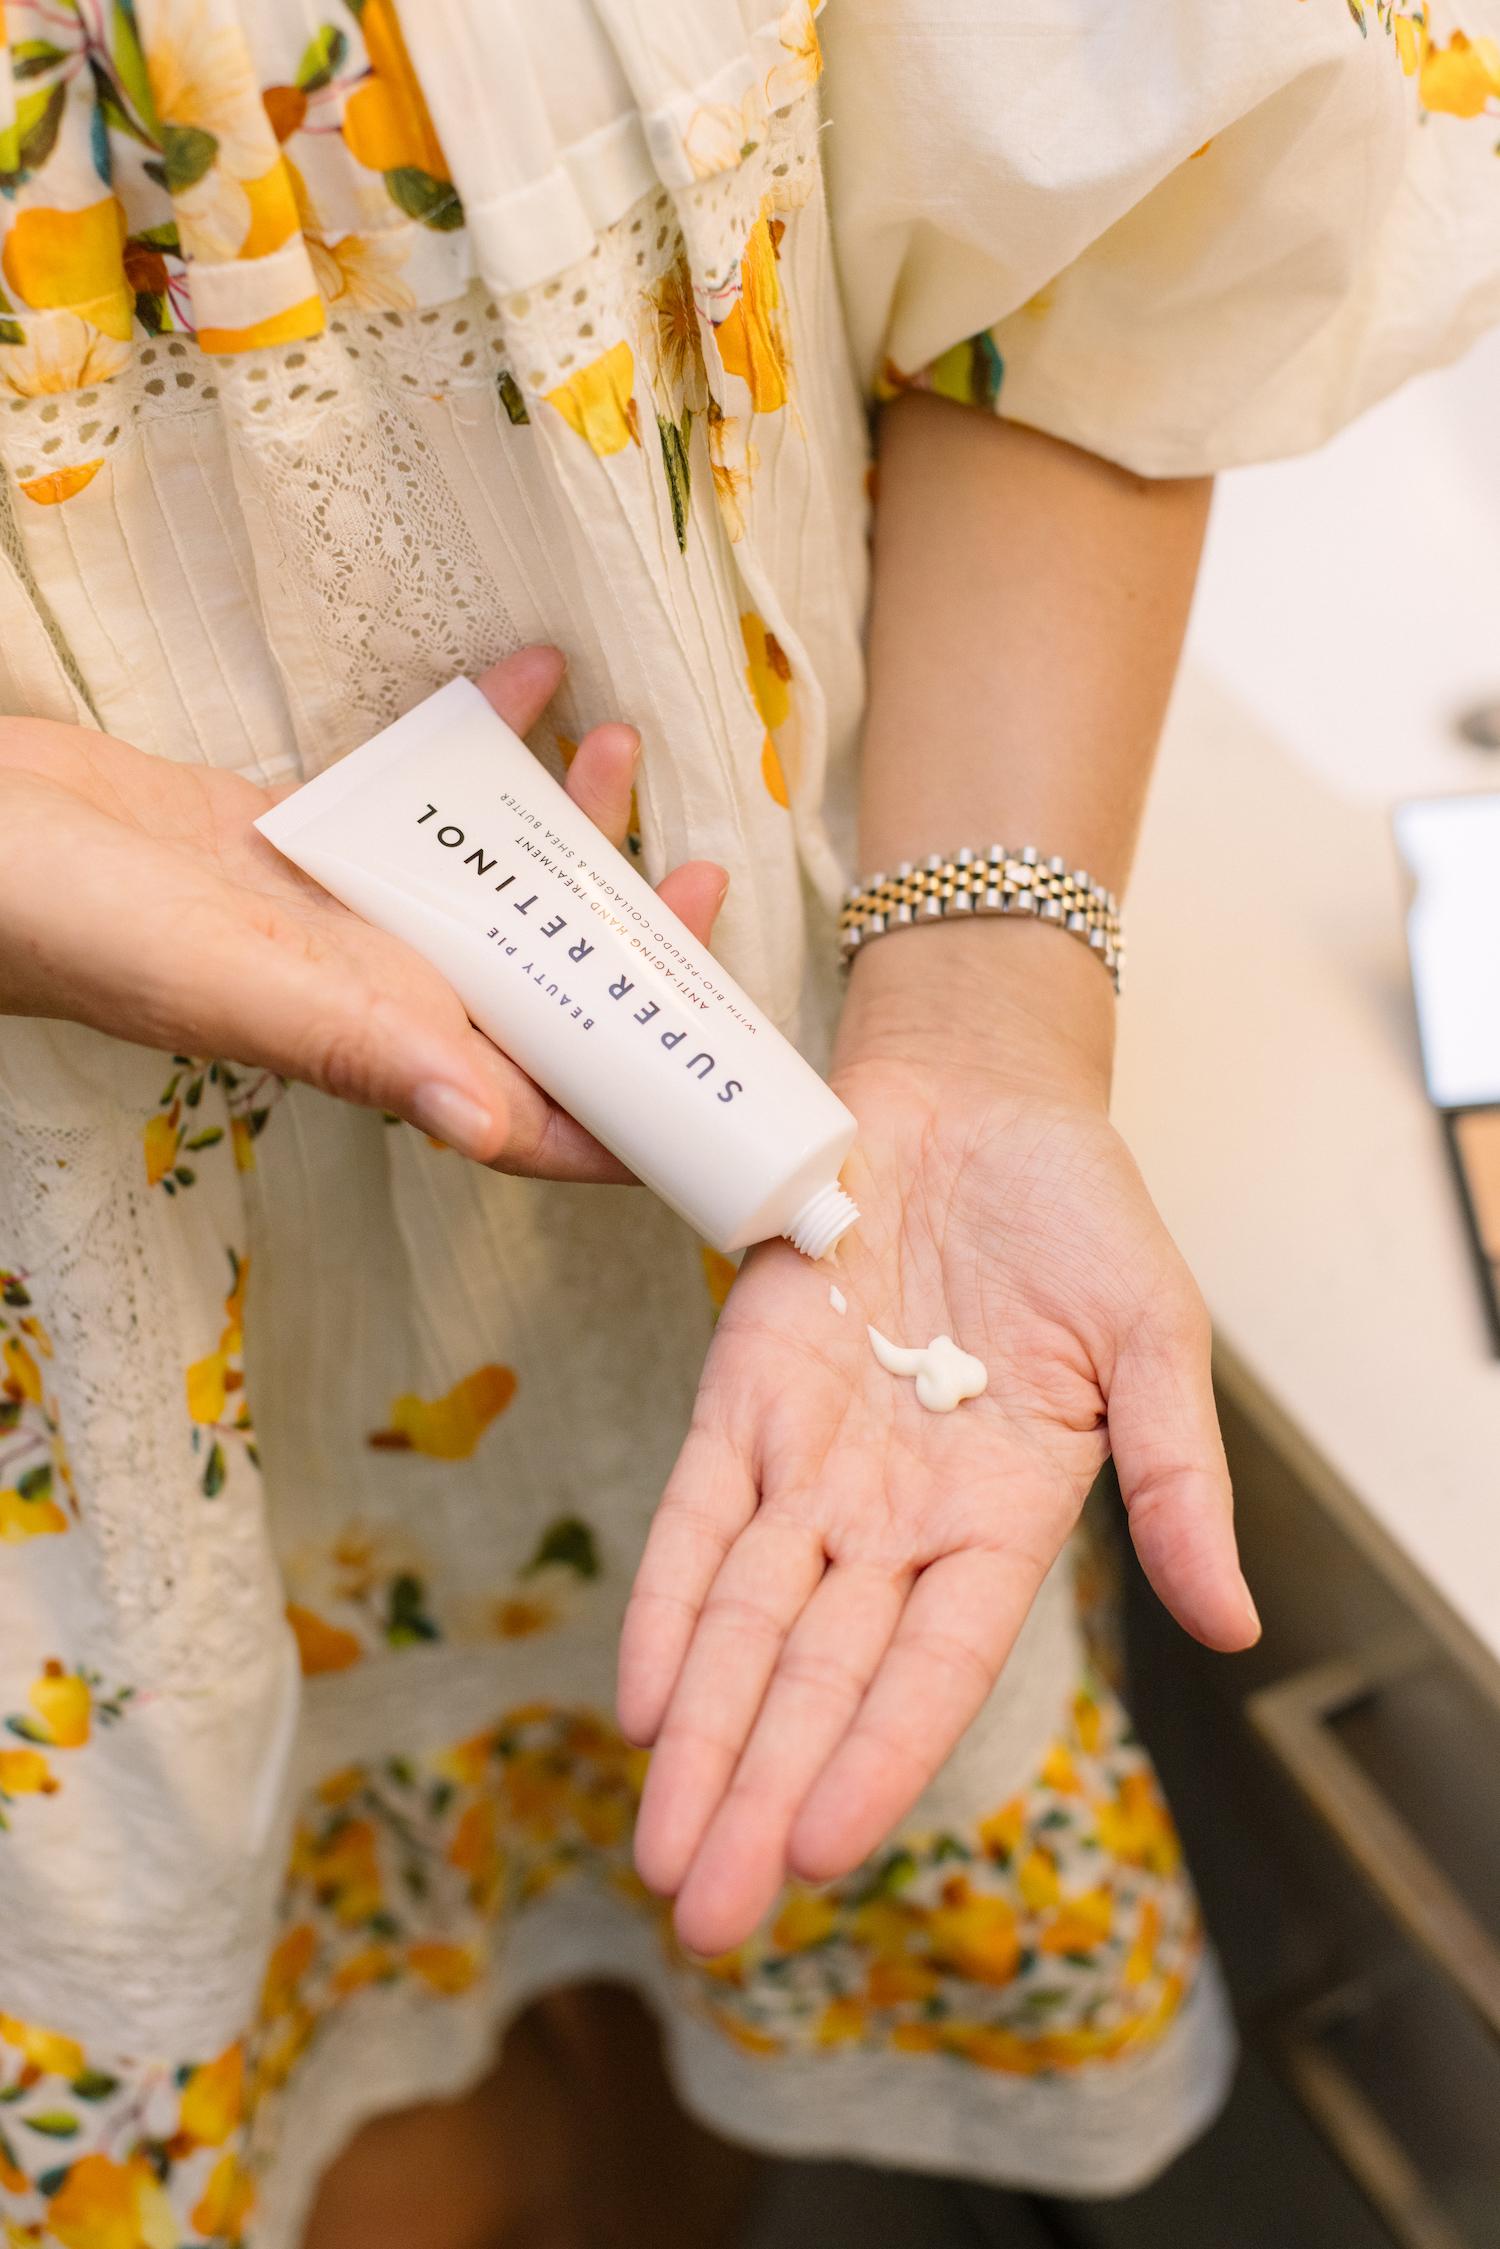 Super Retinol Hand Treatment review